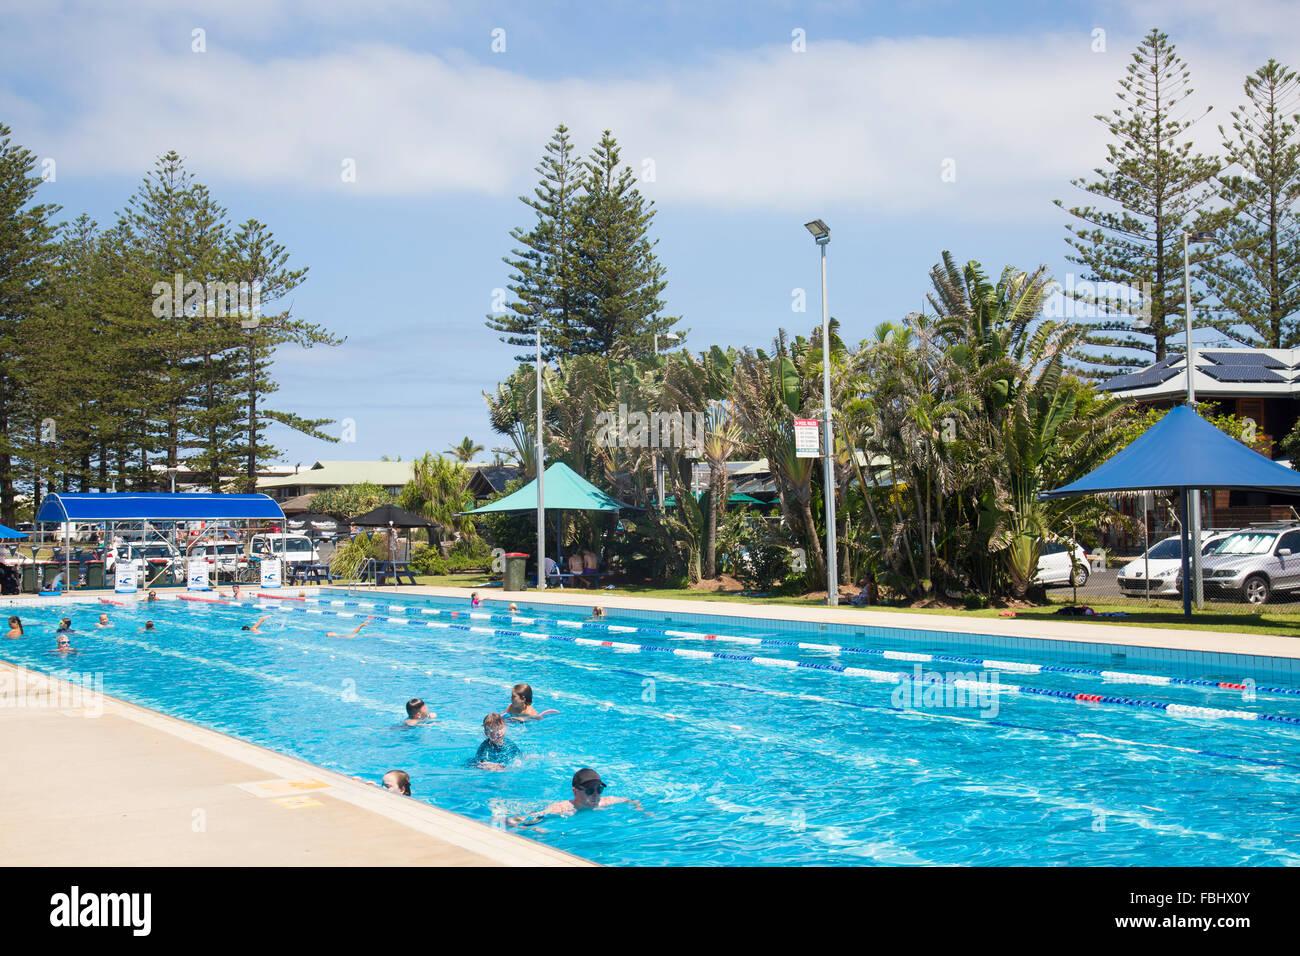 Byron Bay Public Open Air Olympic Size Swimming Pool Near Main Stock Photo 93206651 Alamy